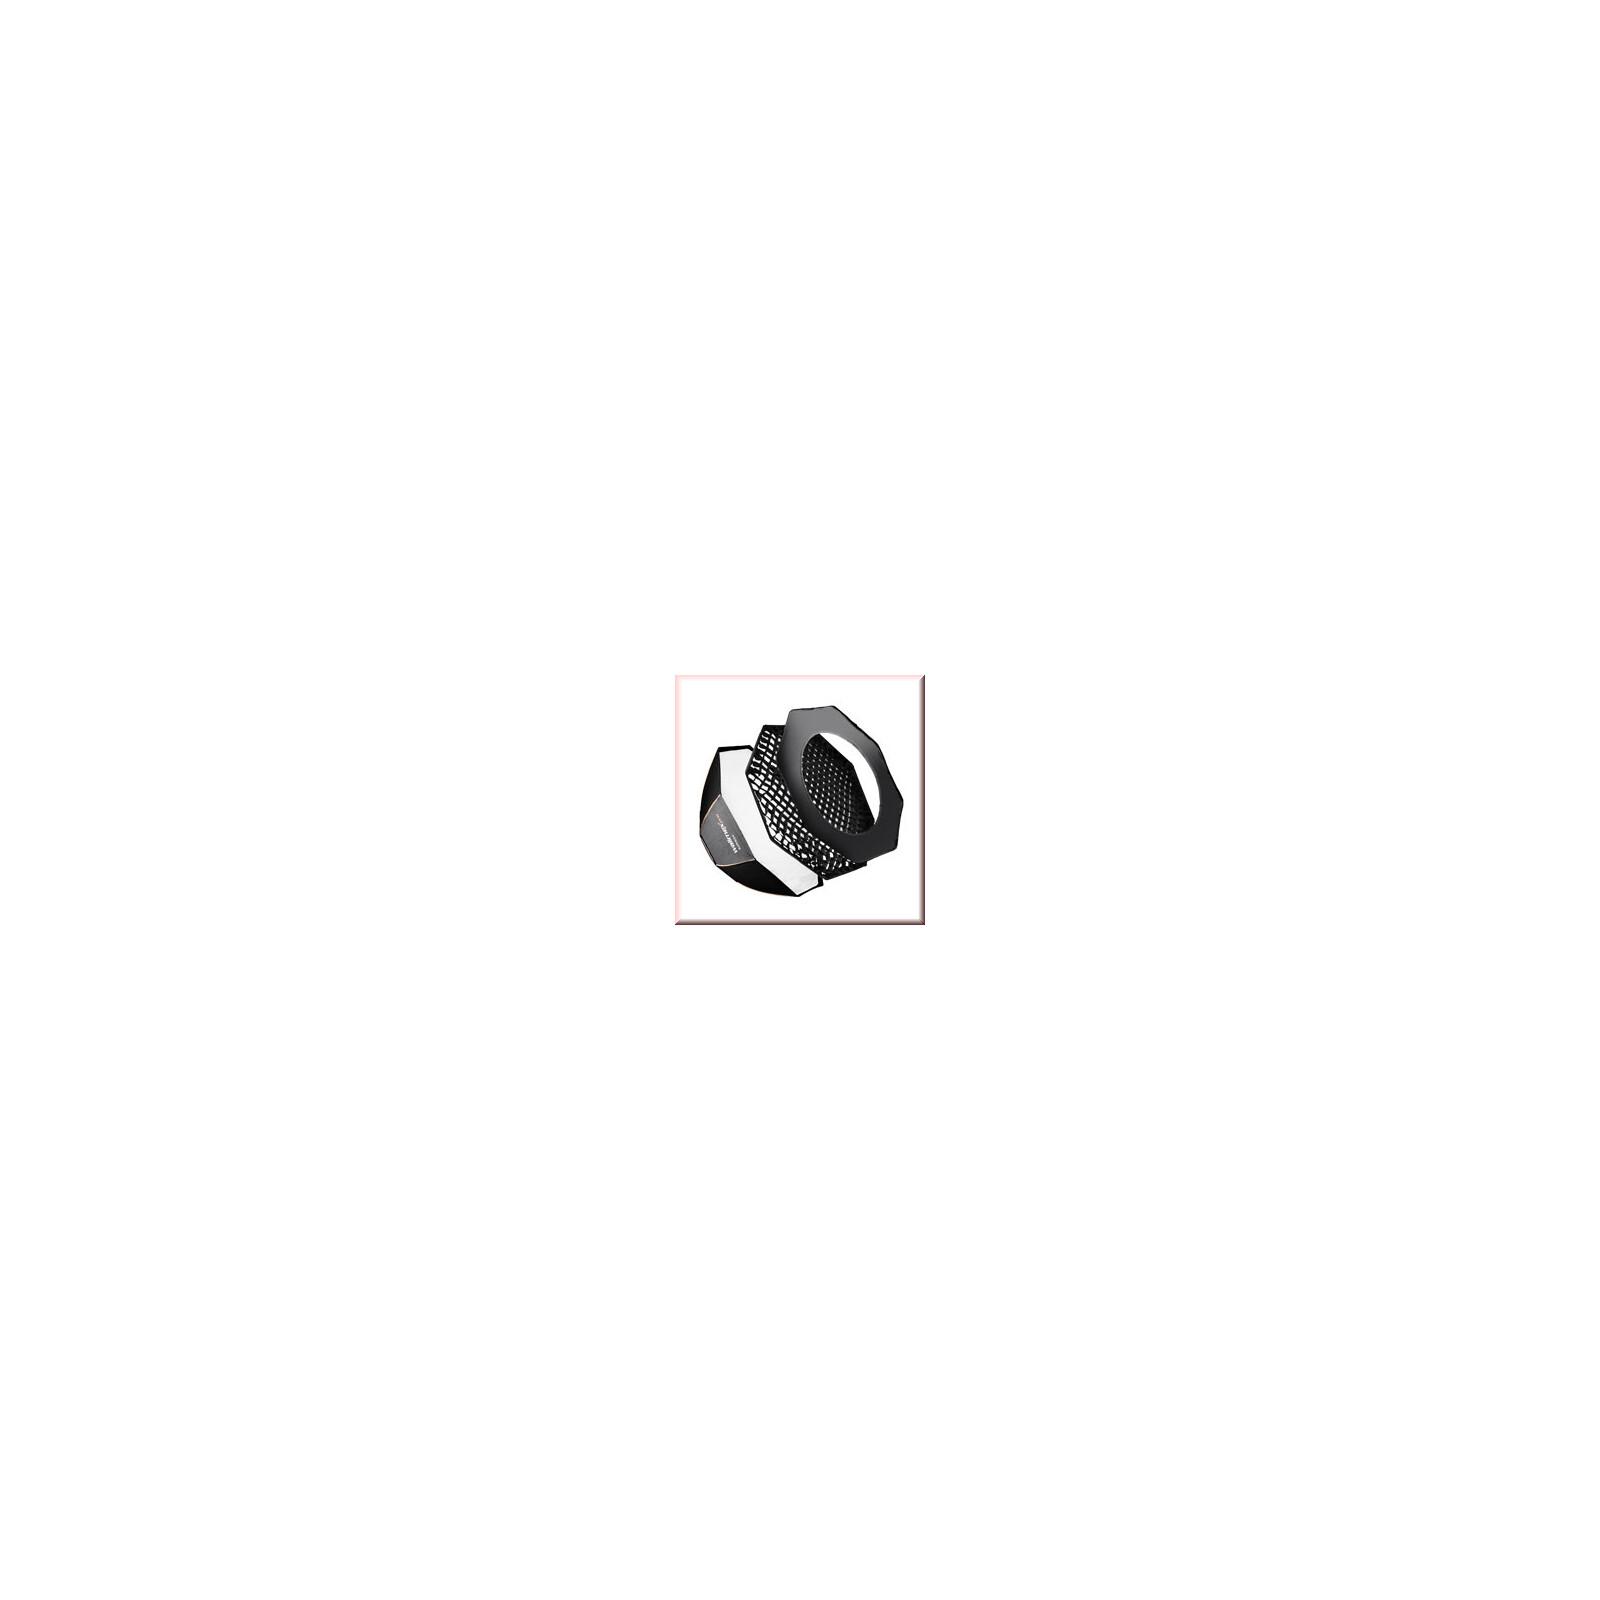 walimex pro Octa Softbox PLUS OL Ø170 Elinchrom